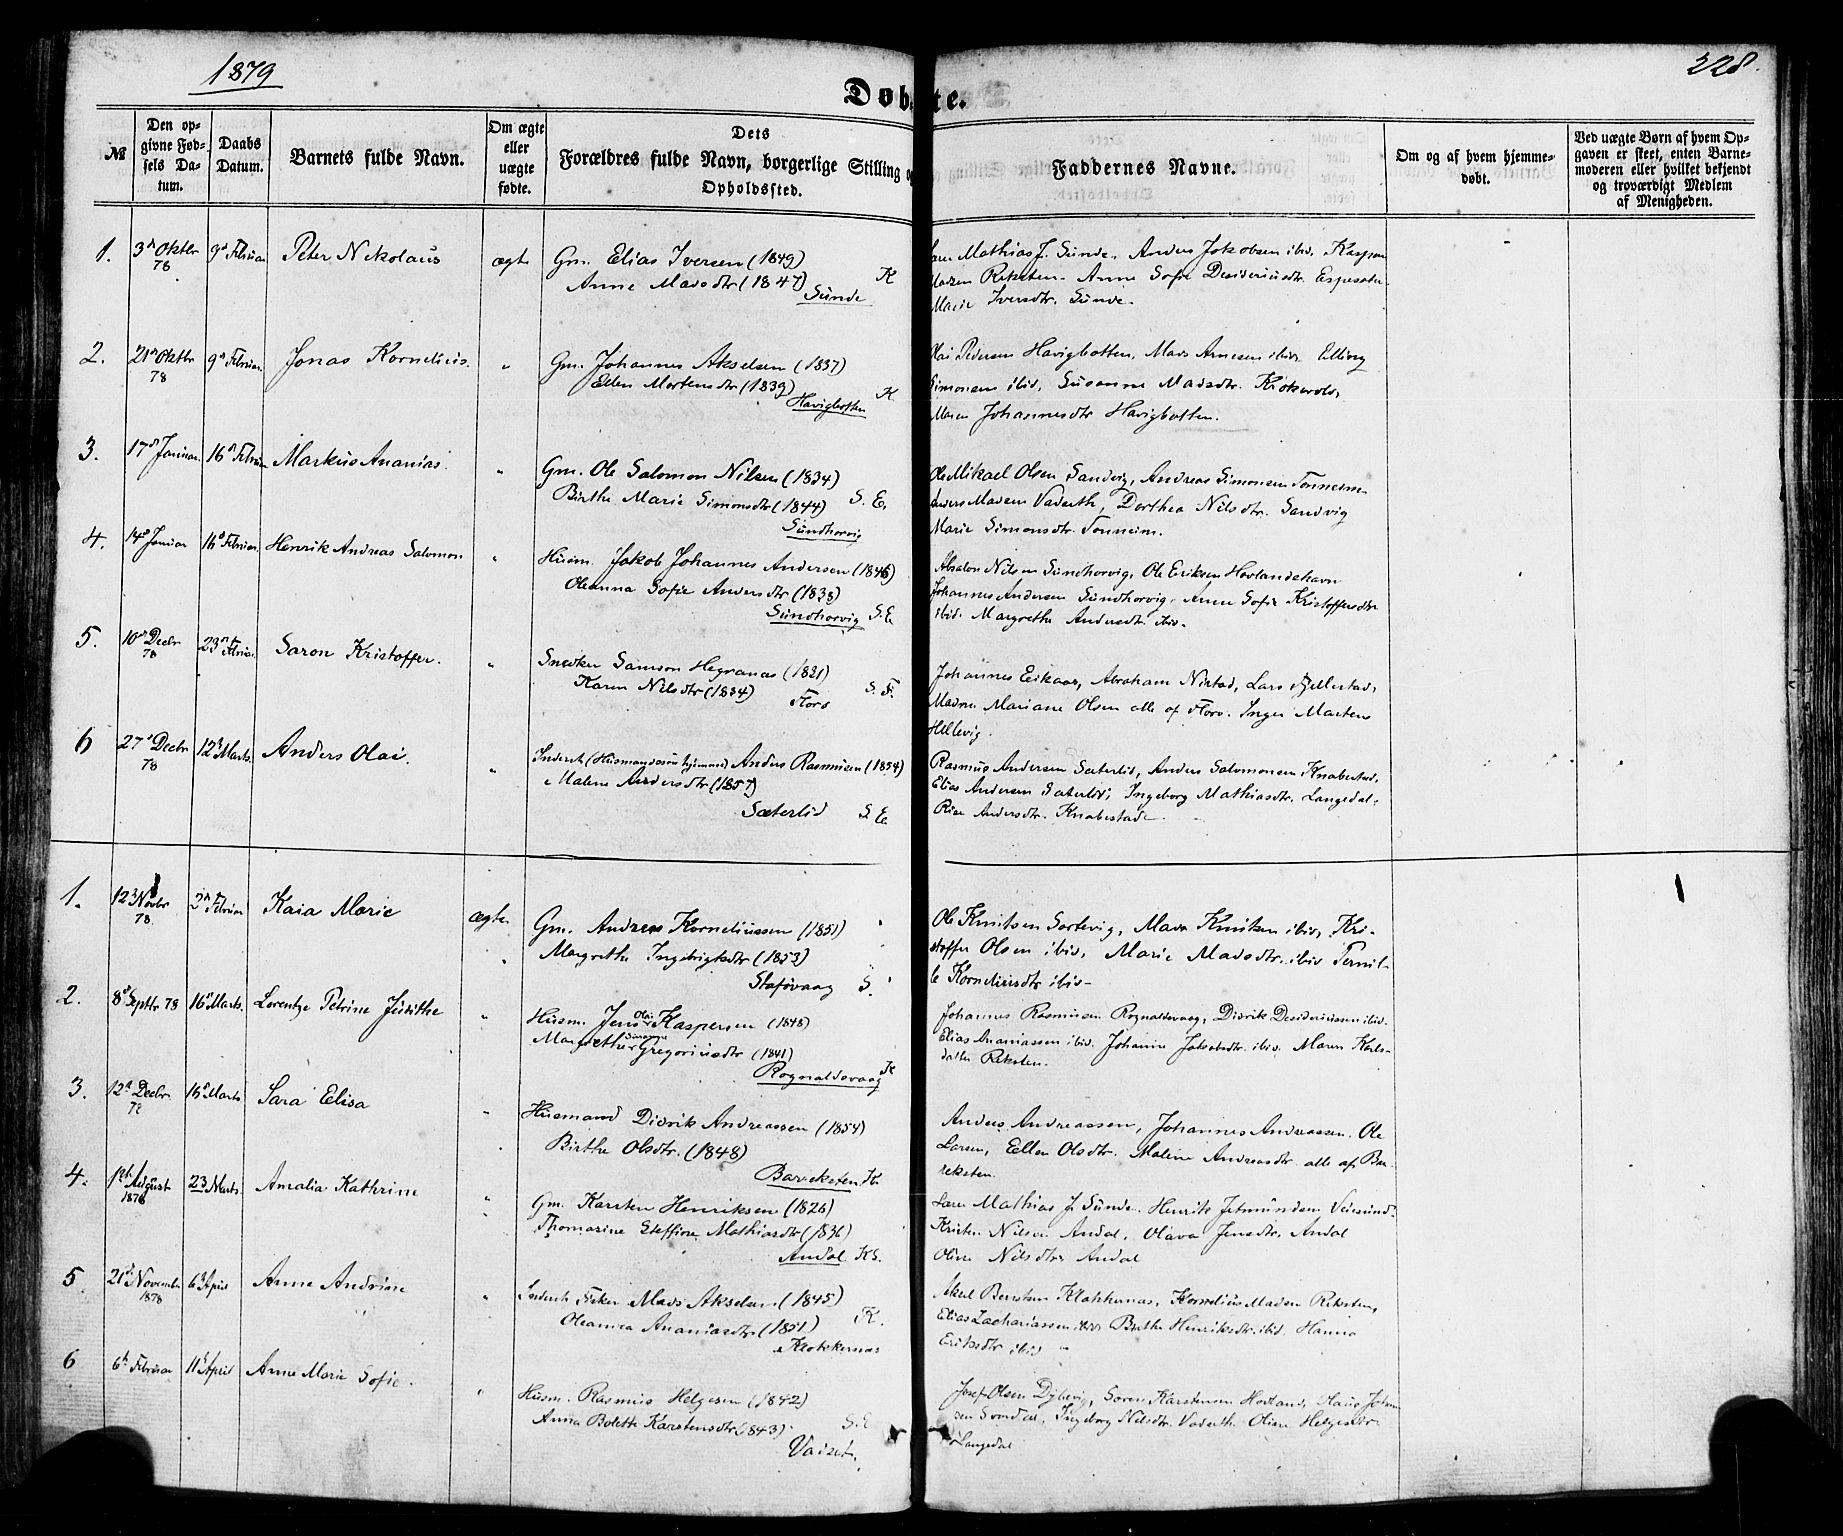 SAB, Kinn sokneprestembete, H/Haa/Haaa/L0006: Parish register (official) no. A 6, 1857-1885, p. 228